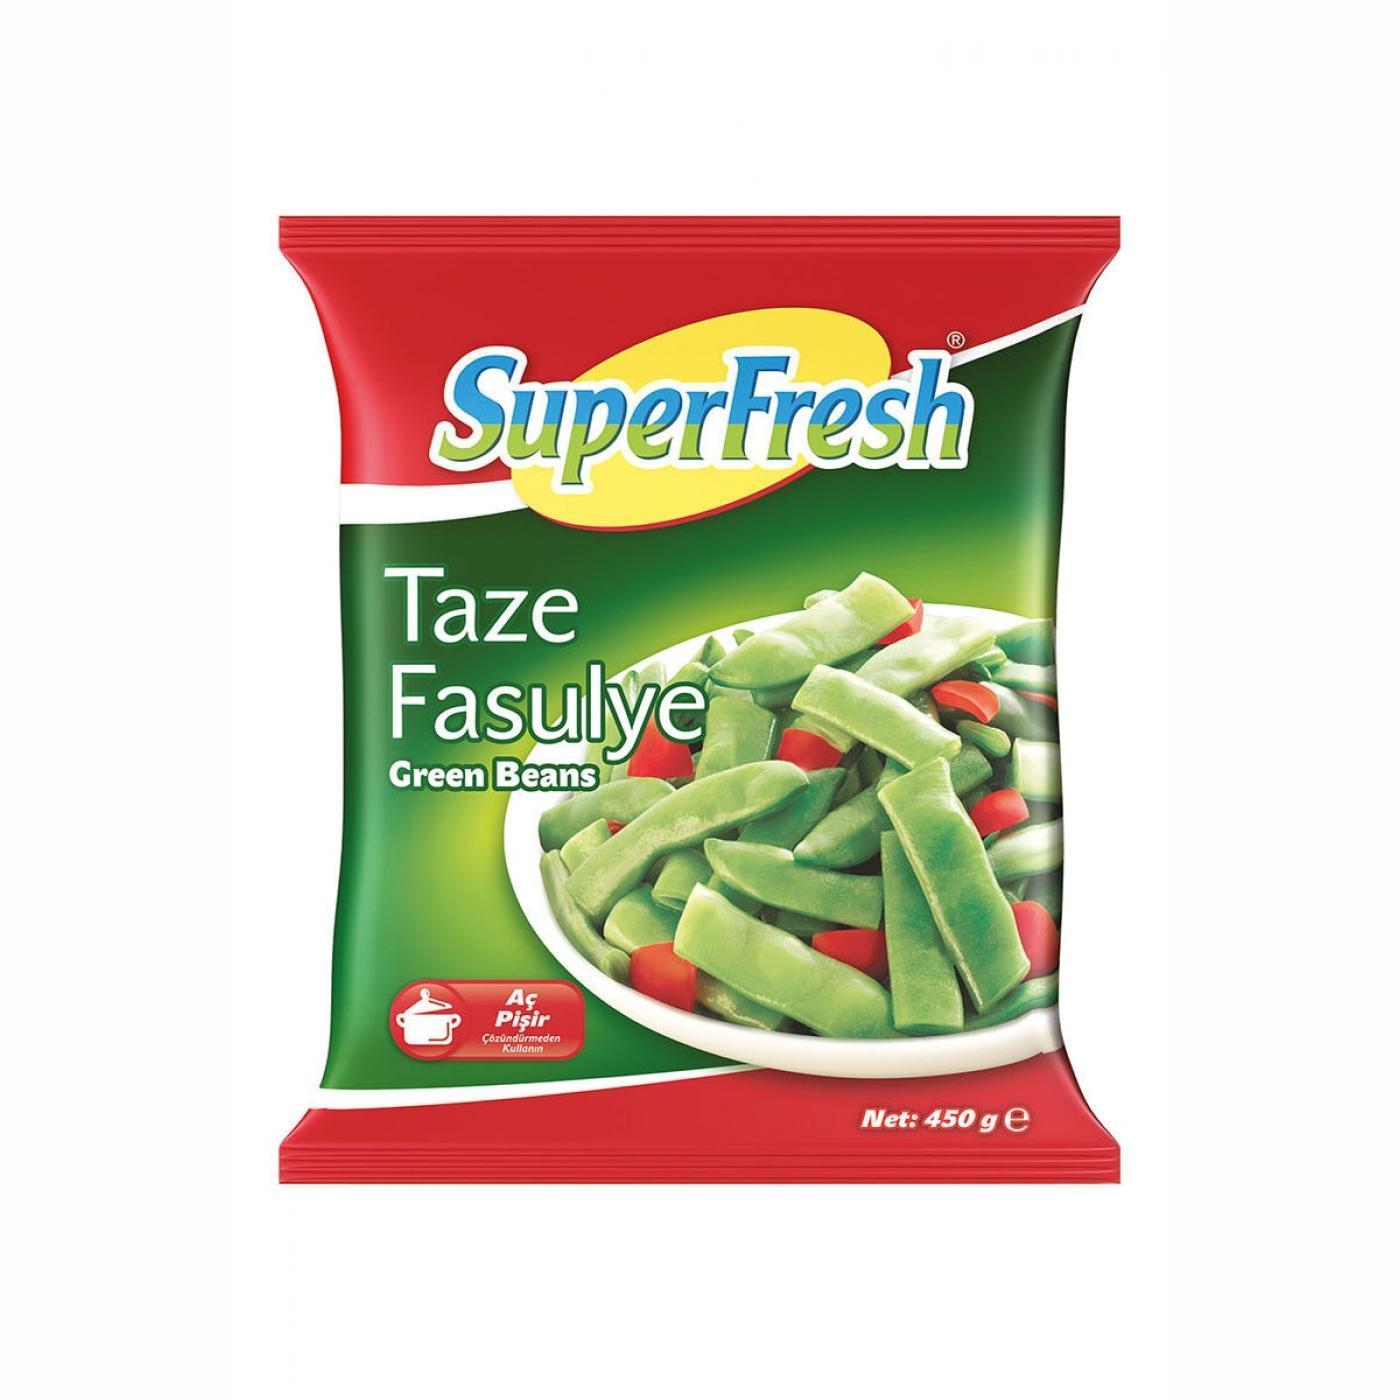 SUPERFRESH TAZE FASULYE 450GR